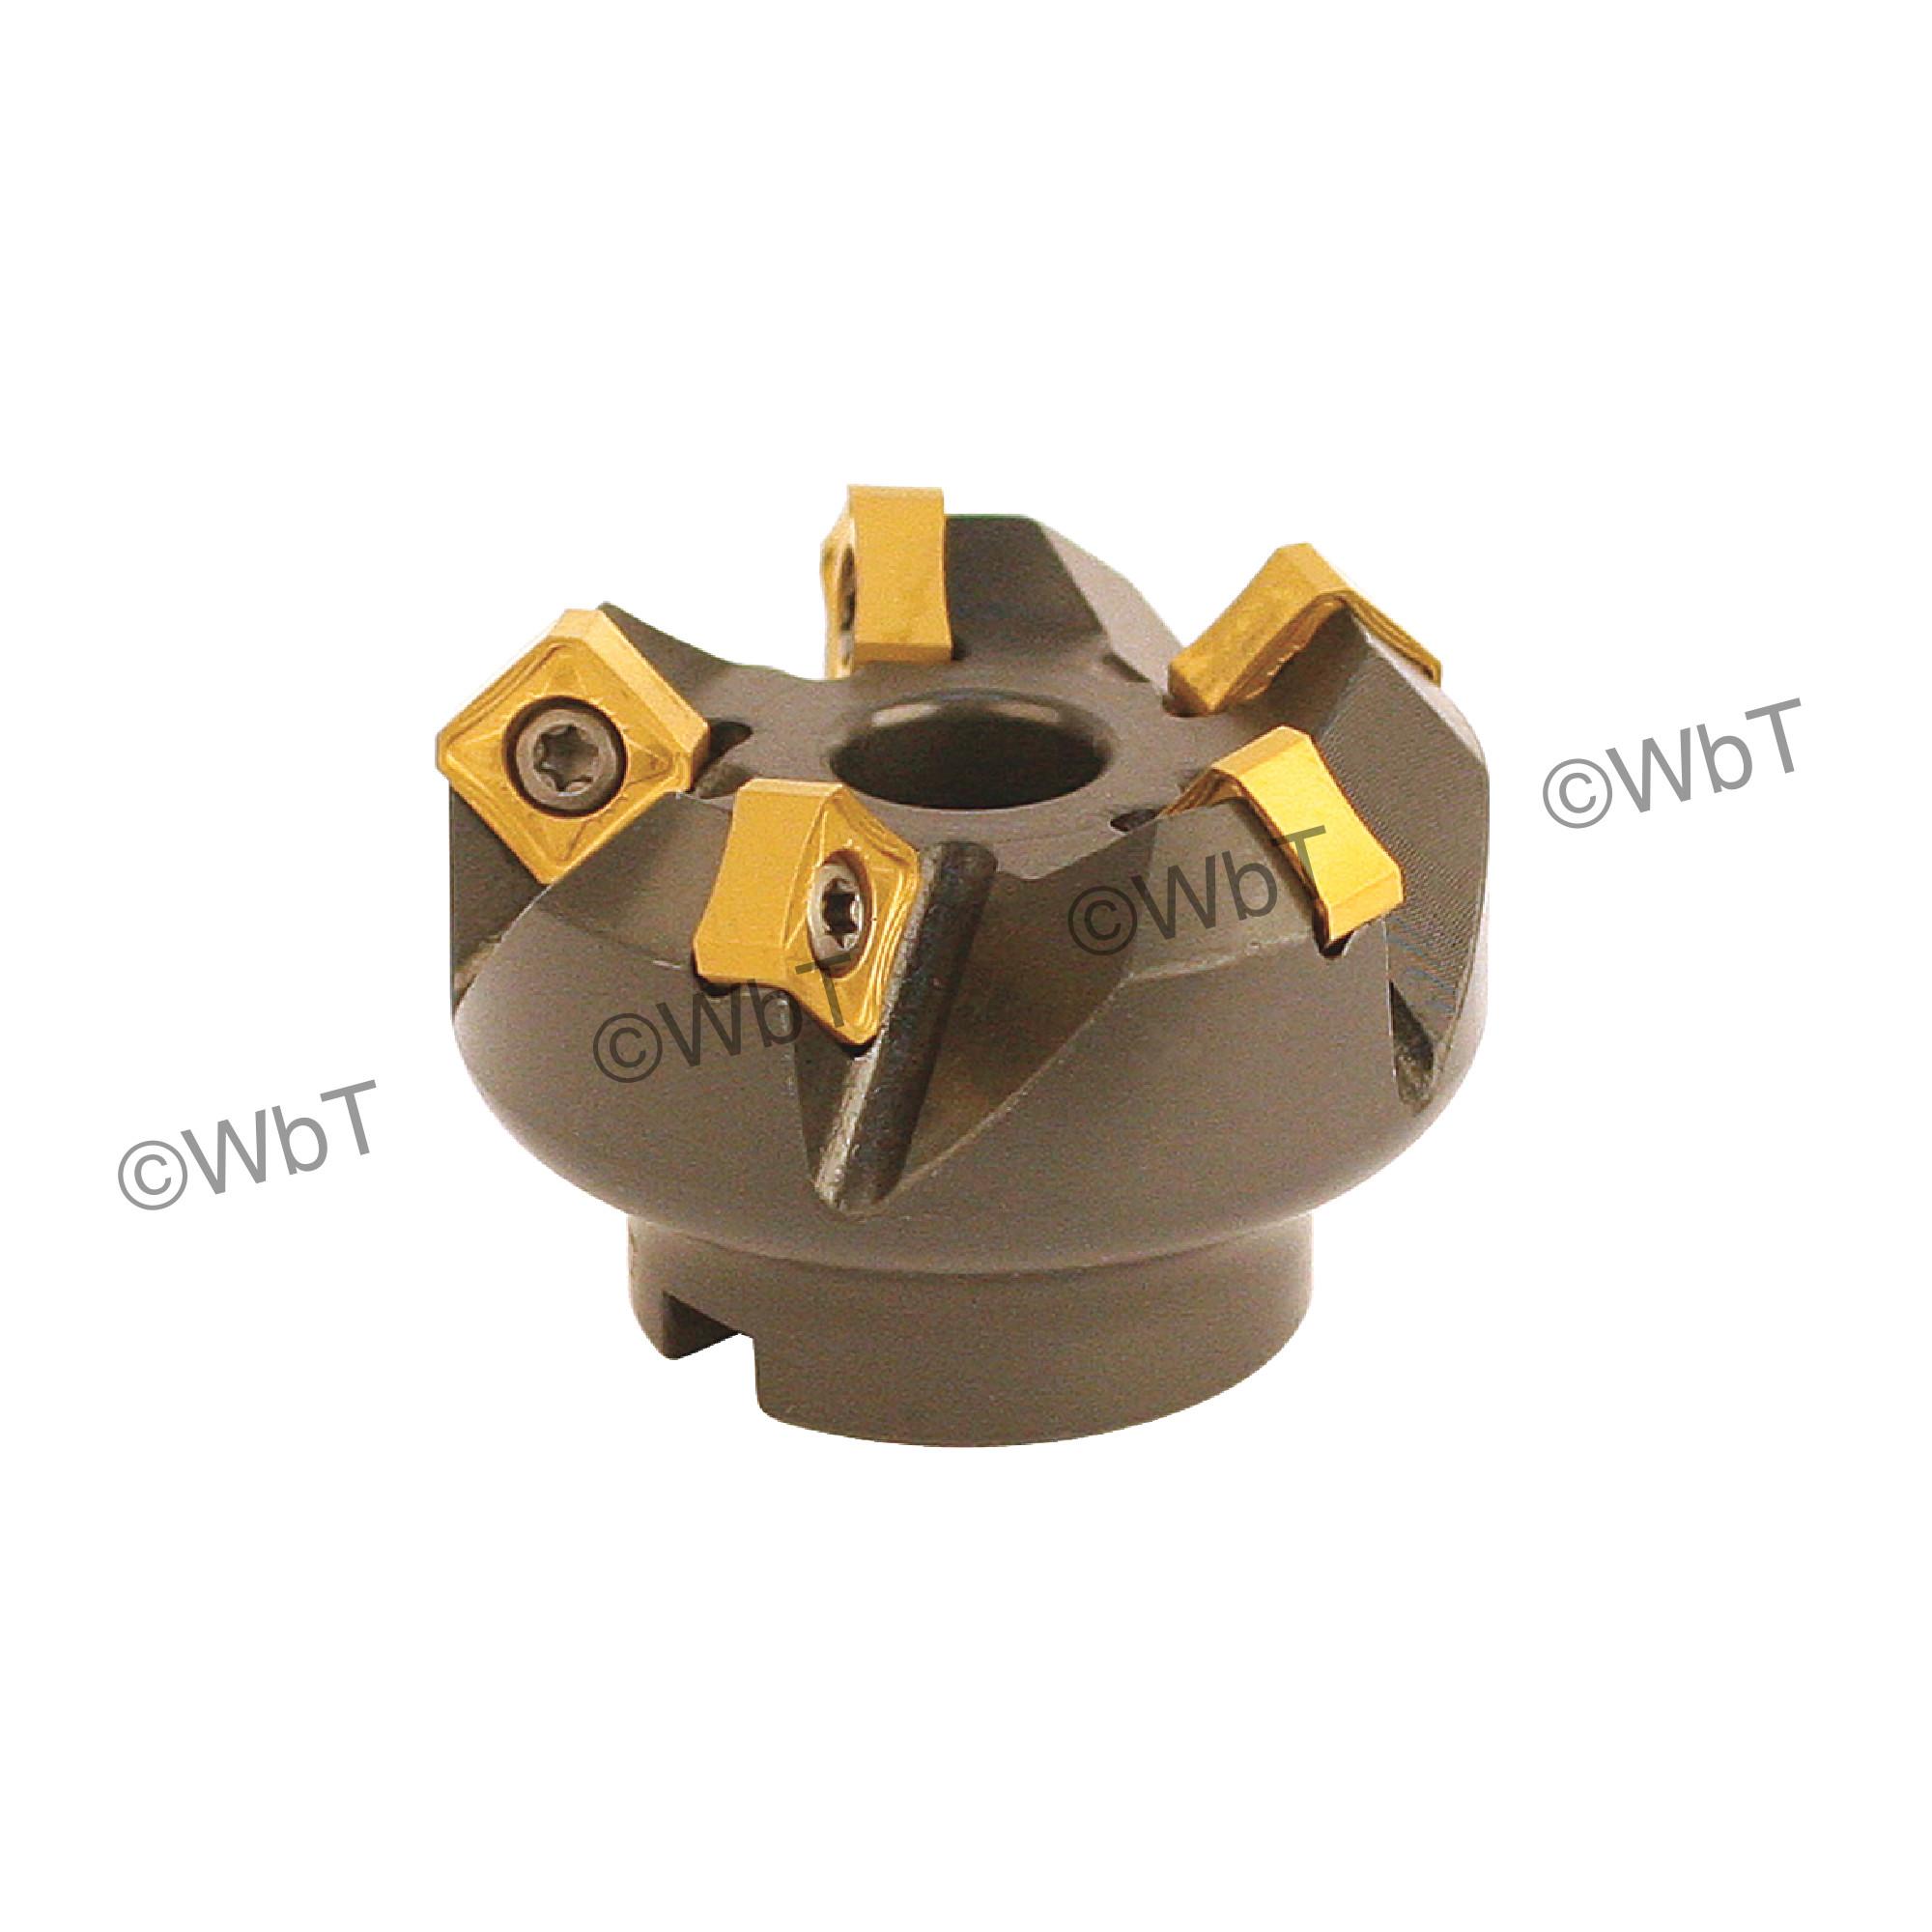 "AKUMA - 2.000"" - 45° Face Mill Set / Includes: (1) SNAC.12.200R-5 (2.0"" ø) & (10) SNMX1205ANN-M1 CM30P Coate"